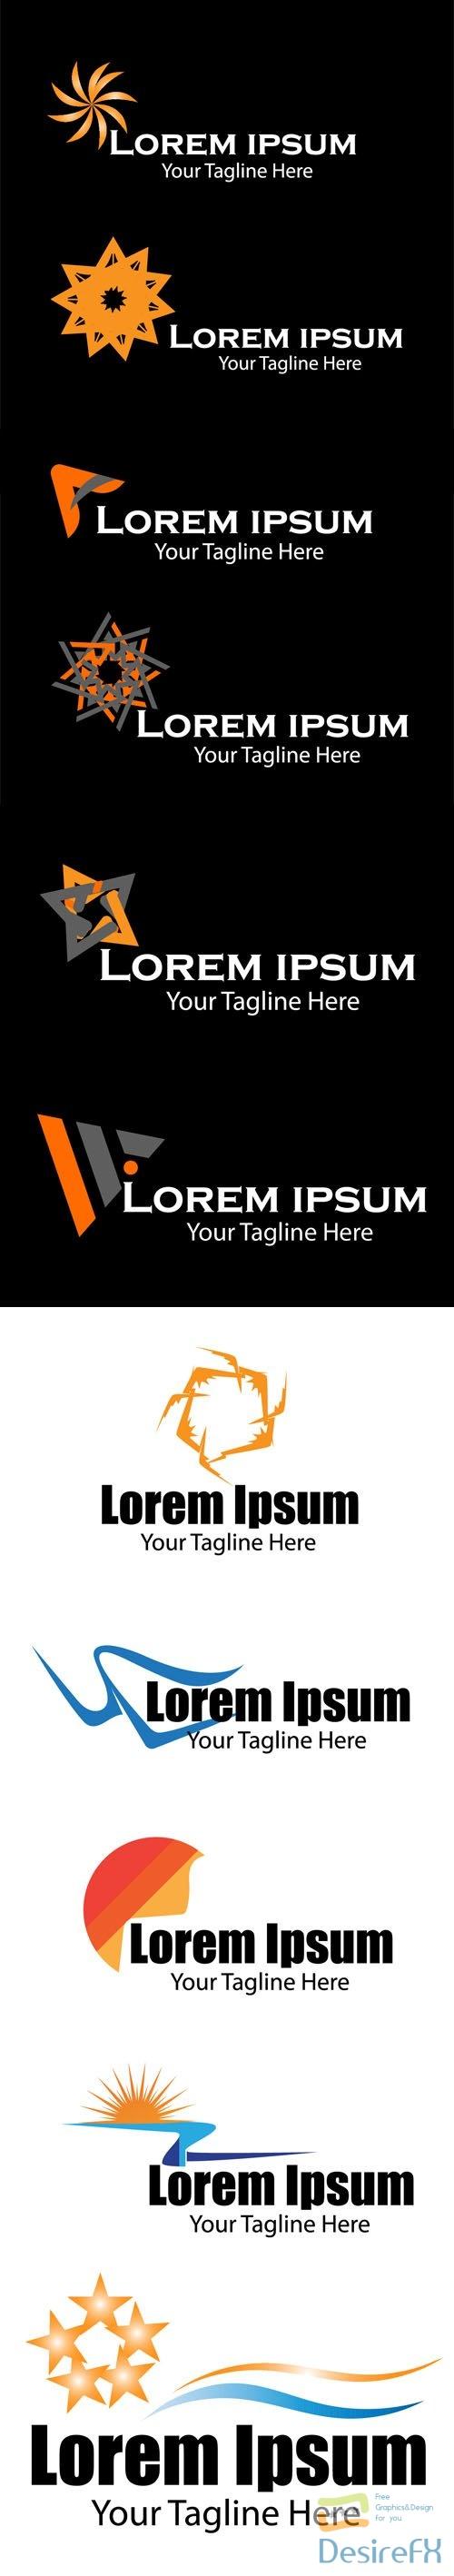 11 Minimal Logo Vector Designs Pack